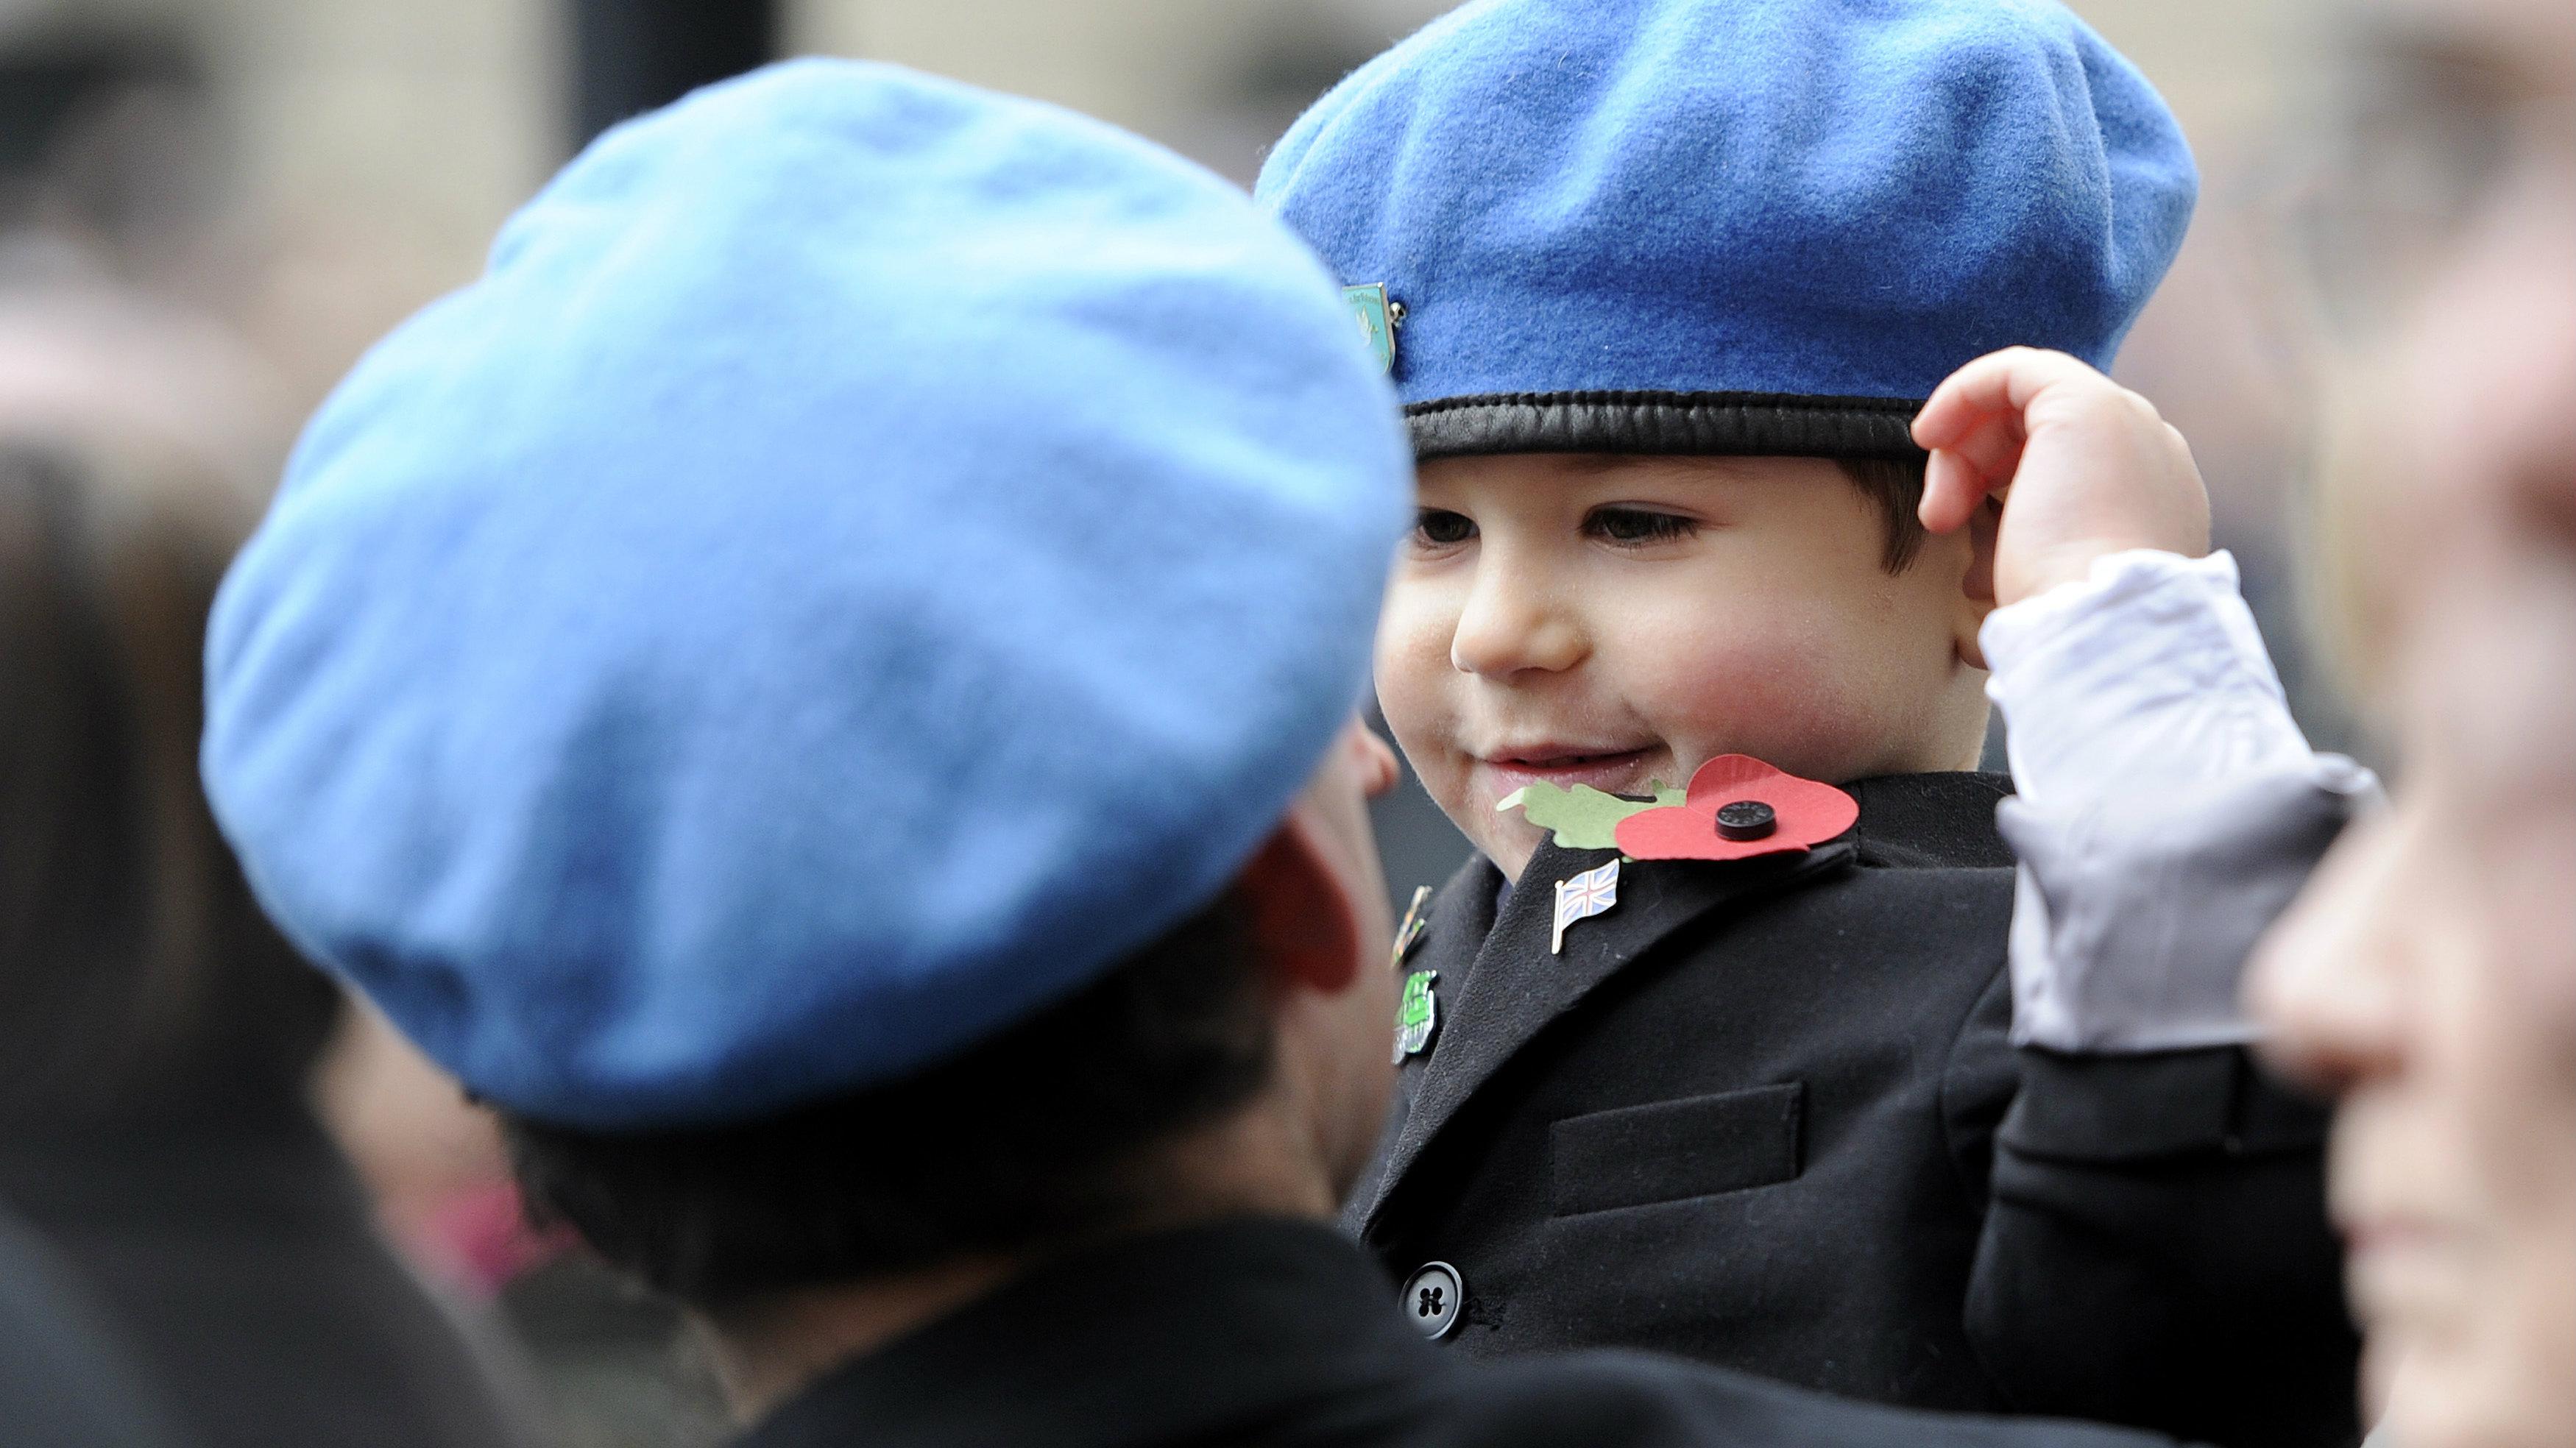 child wearing a beret